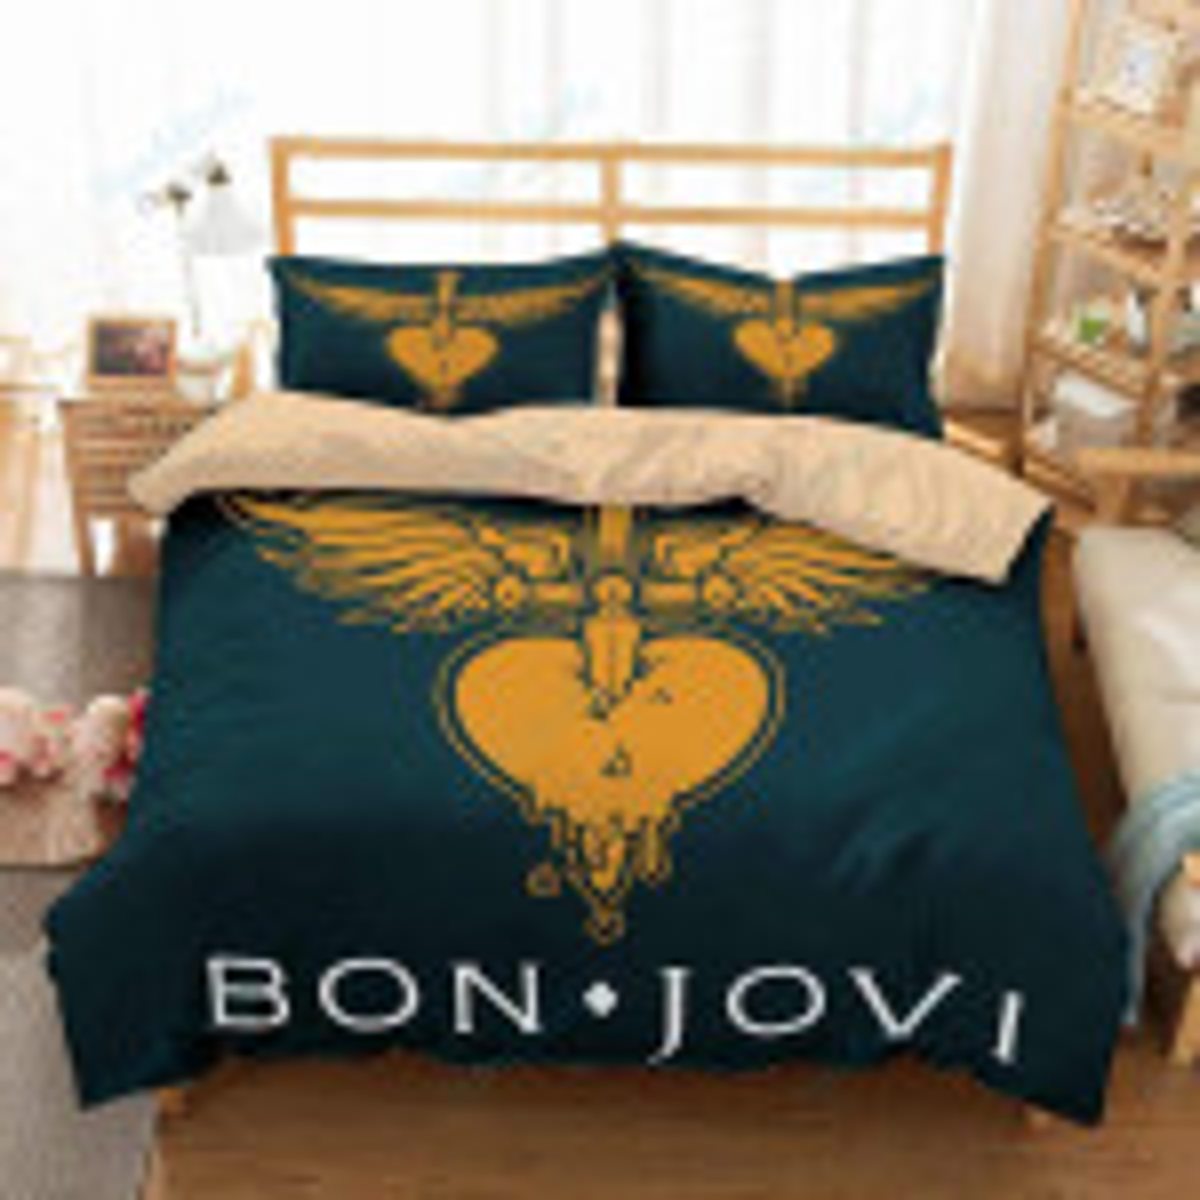 Bon Jovi 2 Duvet Cover Bedding Set